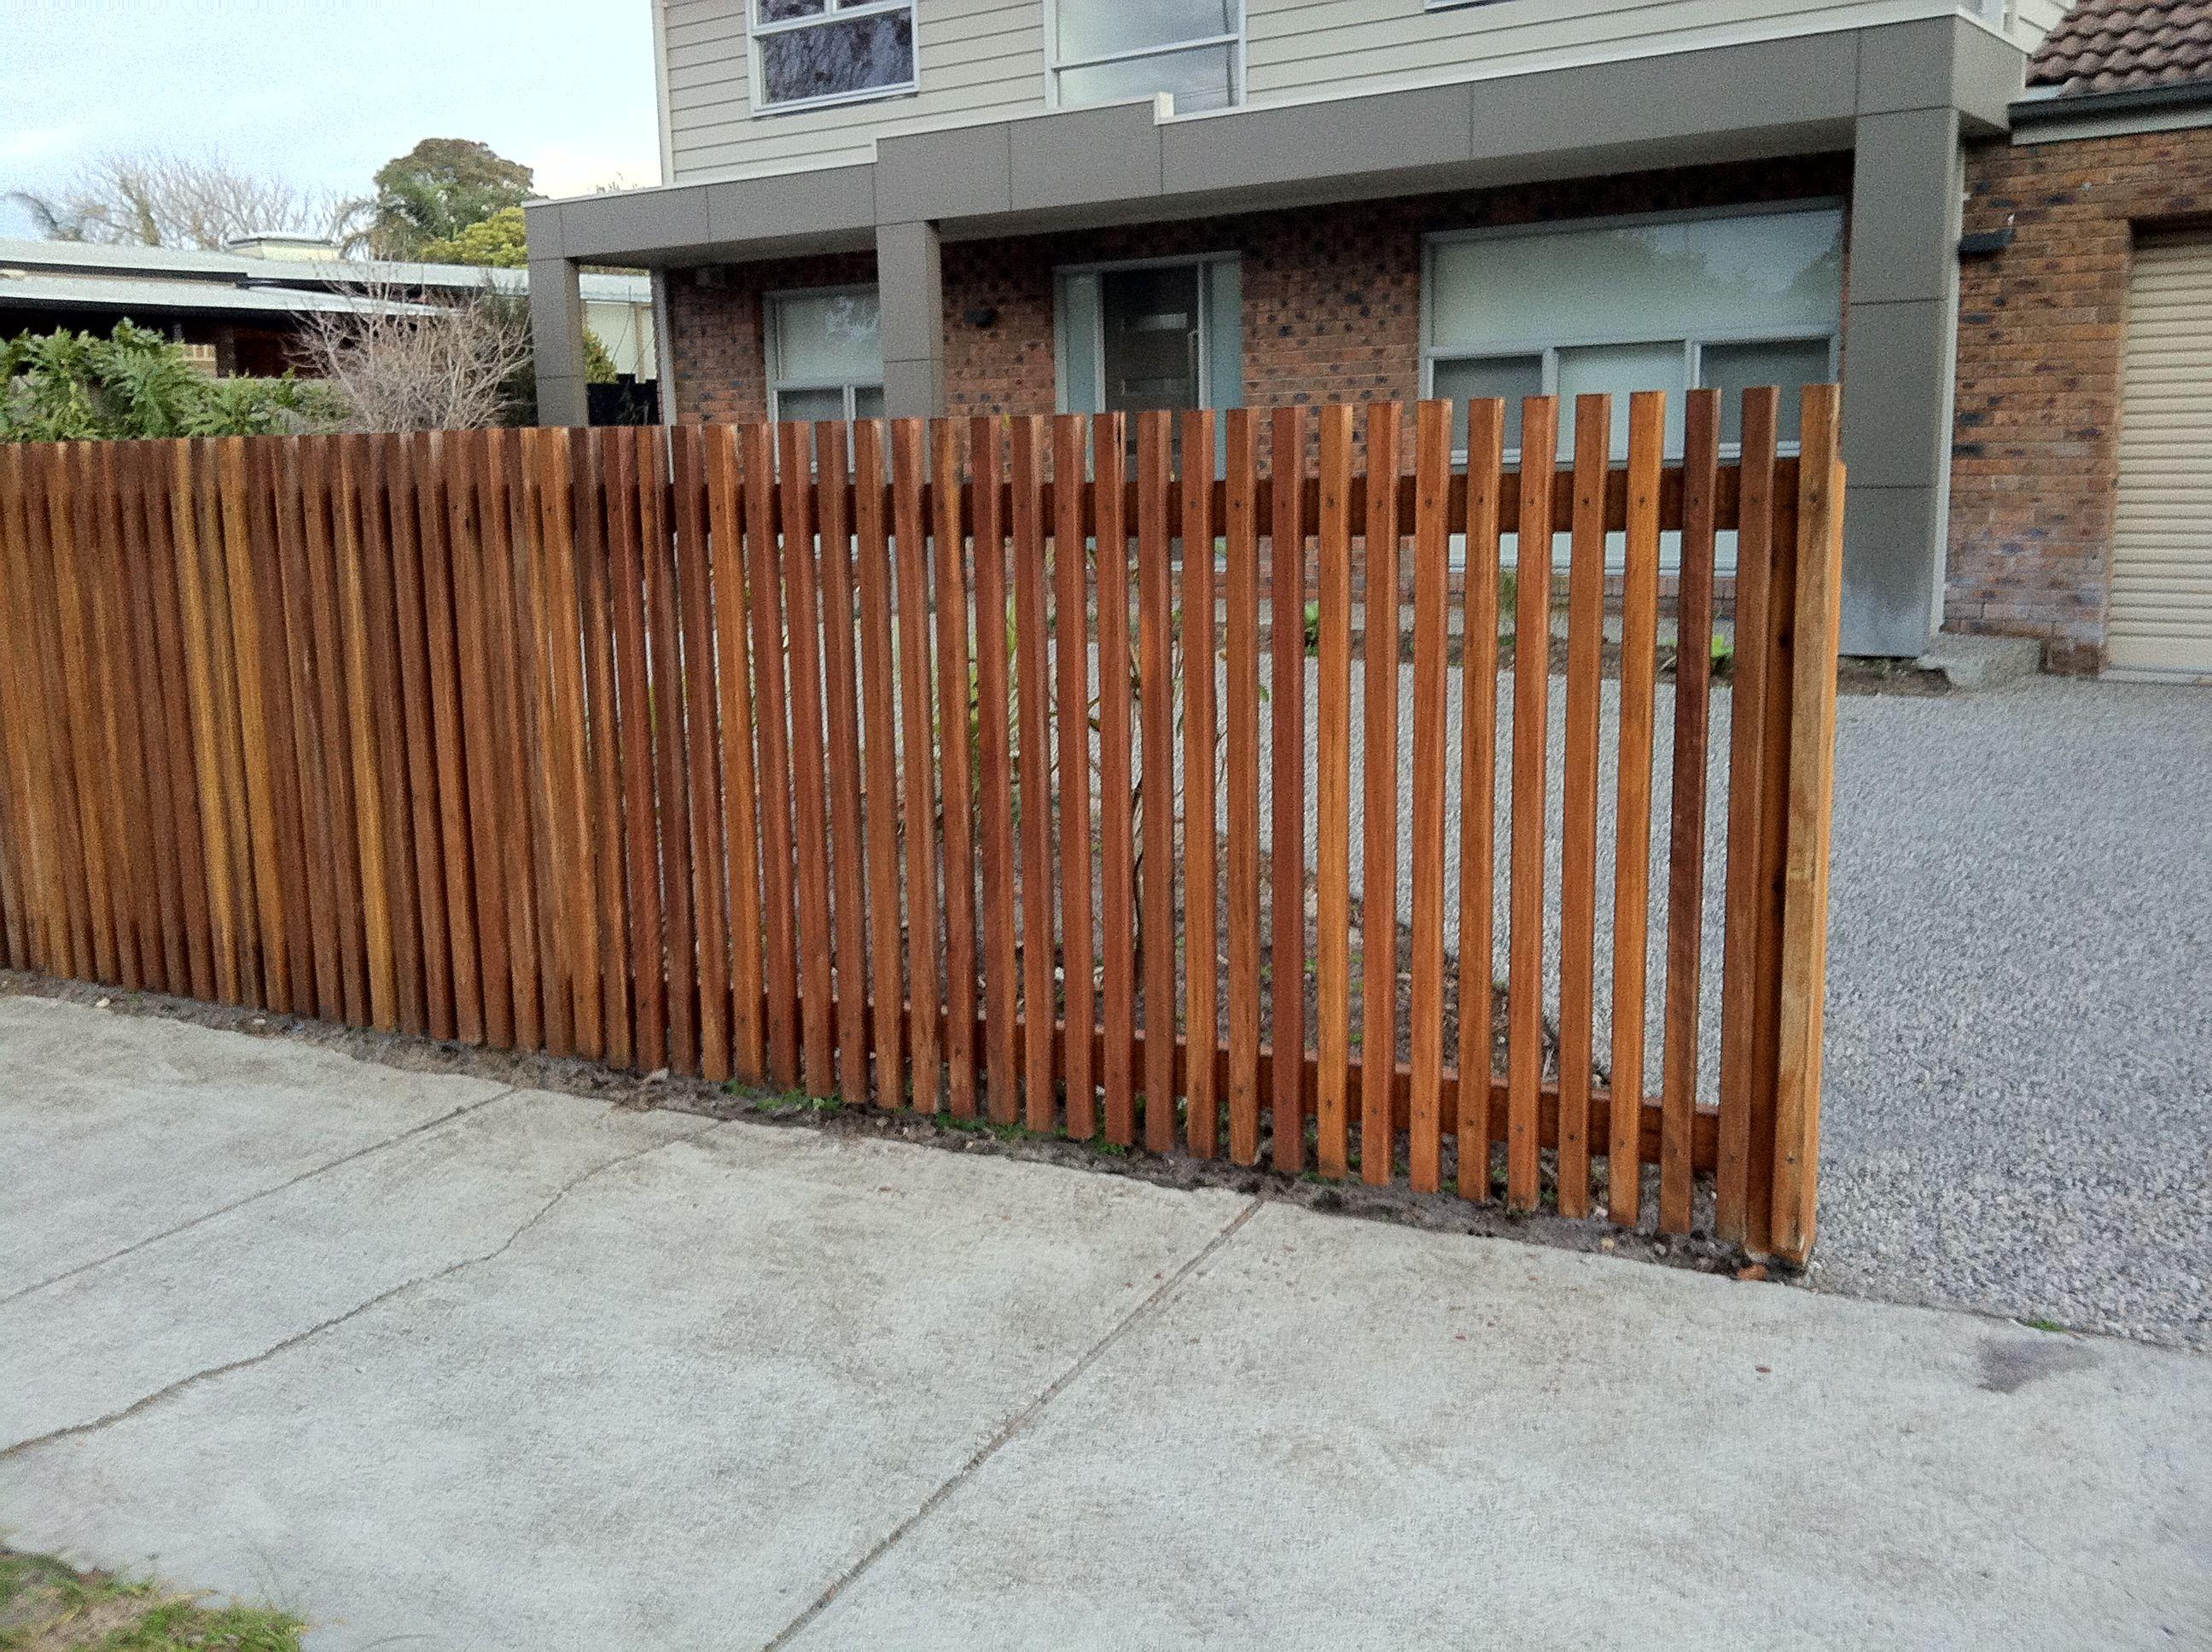 Custom Cedar Wood Privacy Fence Around Pool Built On Top Of Retaining Wall Garden Fencing Cedar Fence Backyard Fences